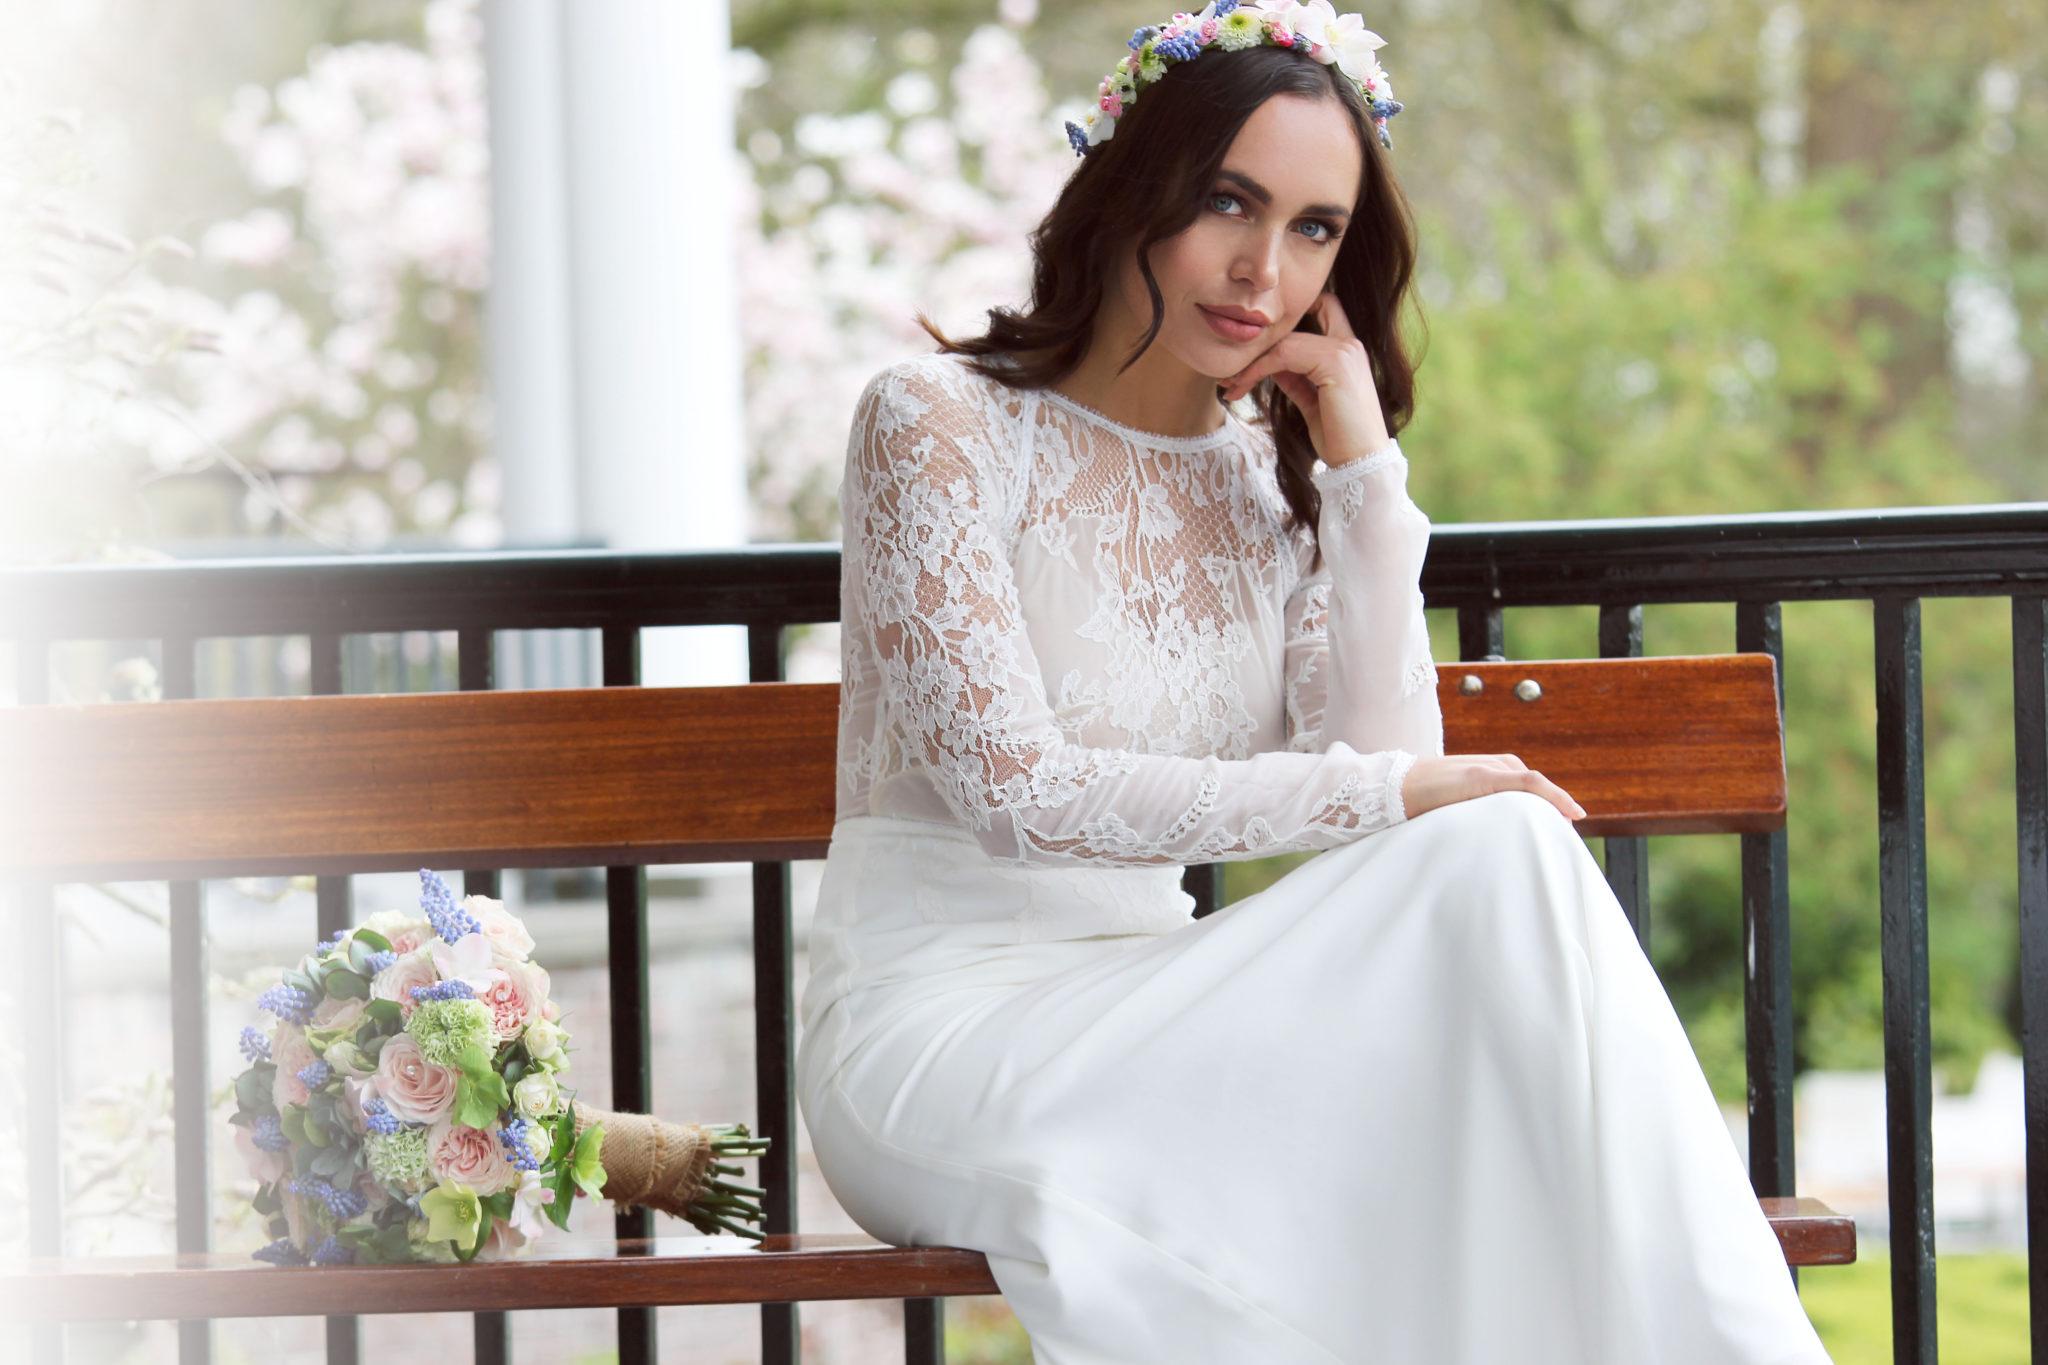 styled wedding shoot rhederoord